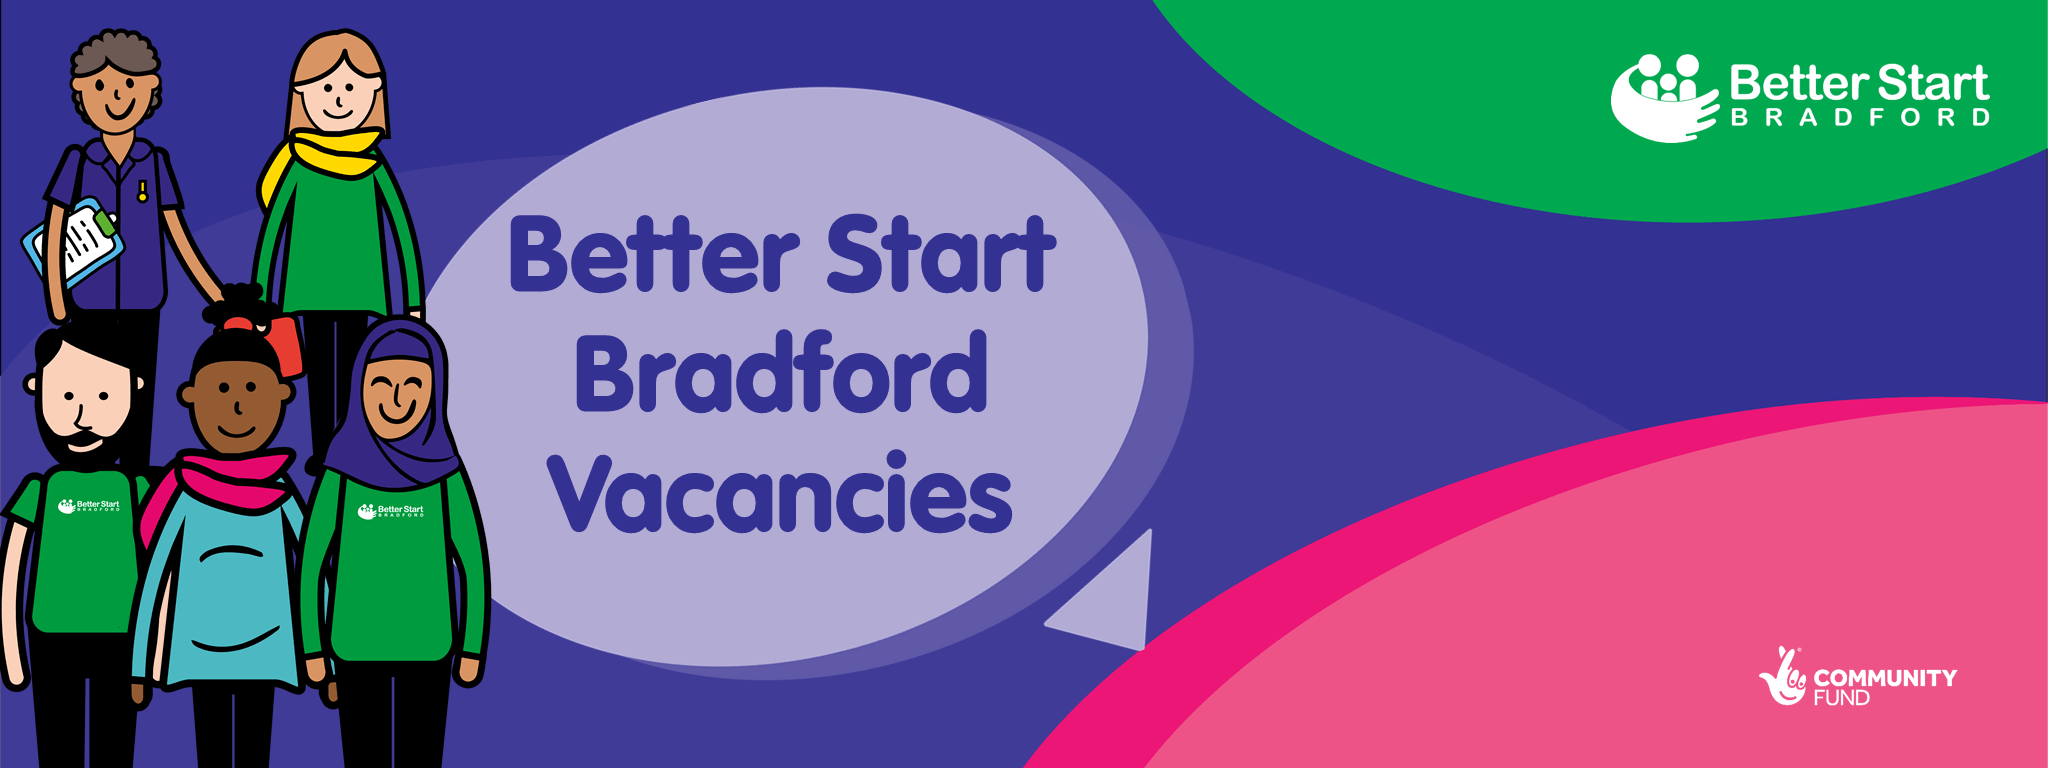 Better Start Bradford vacancies